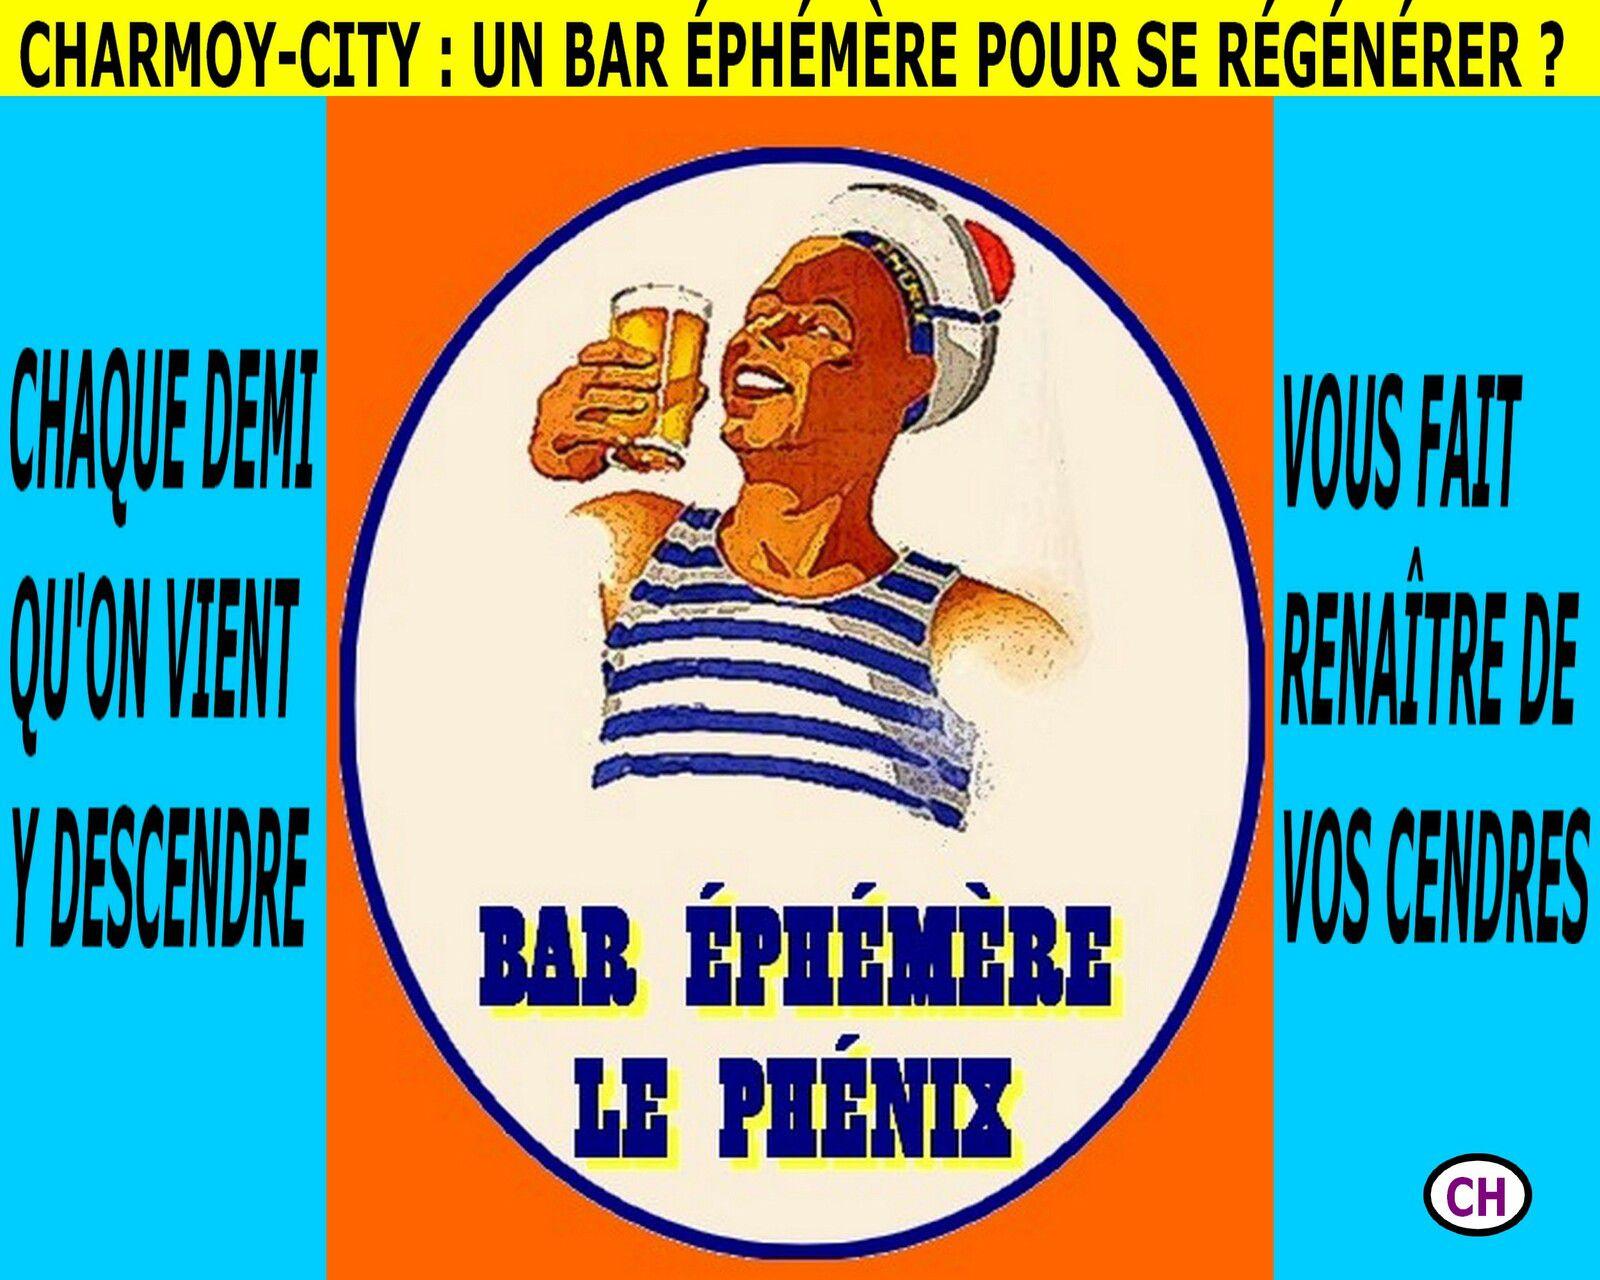 Charmoy-City, un Bar éphémère pour se régénérer.jpg